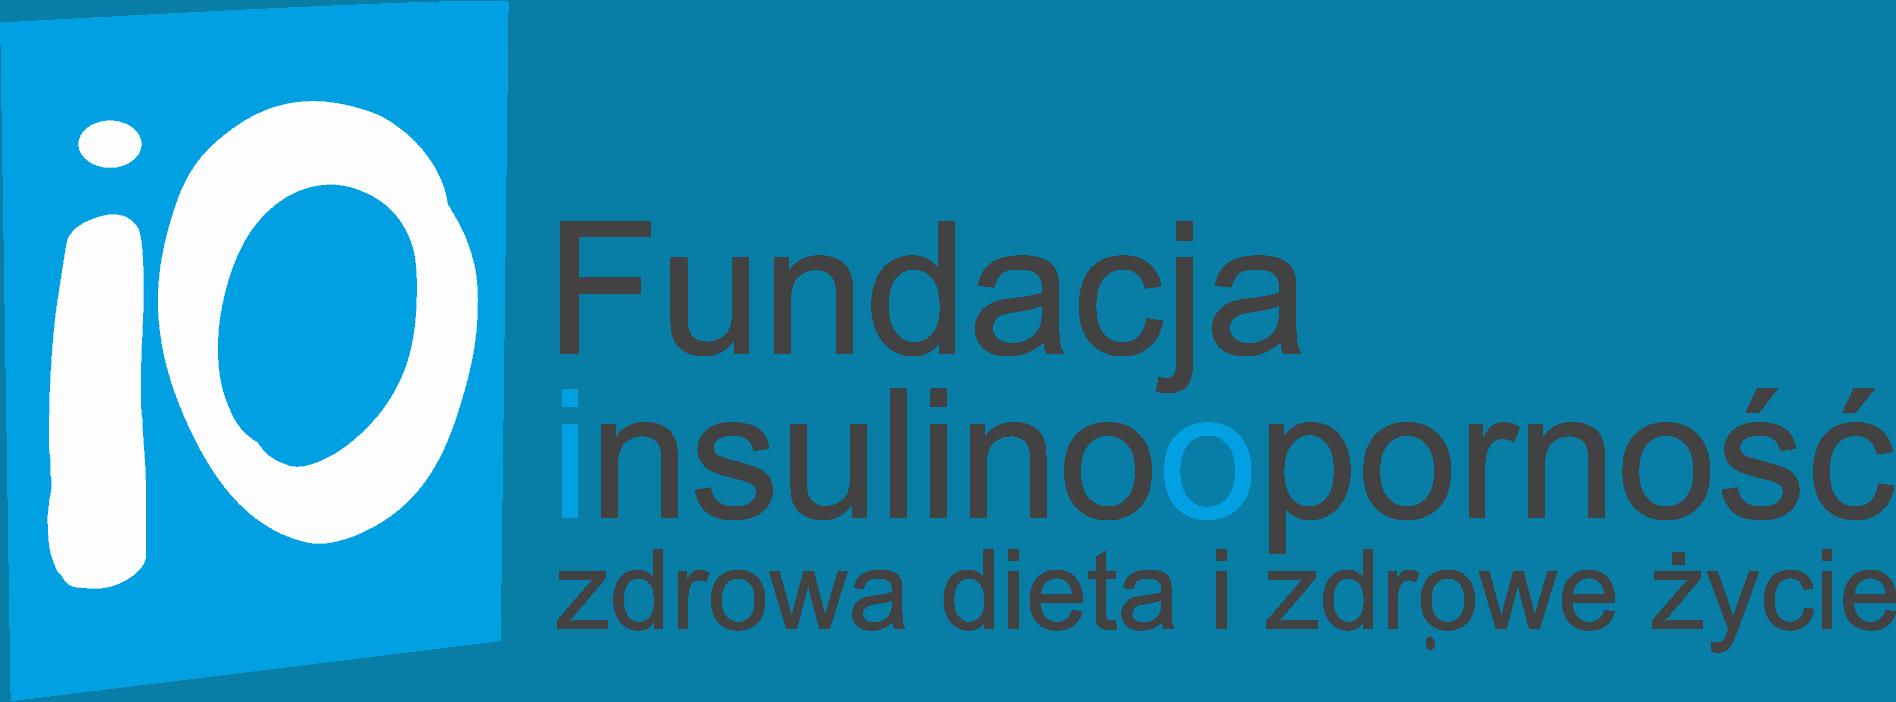 logo-partnera-insulinoopornosc